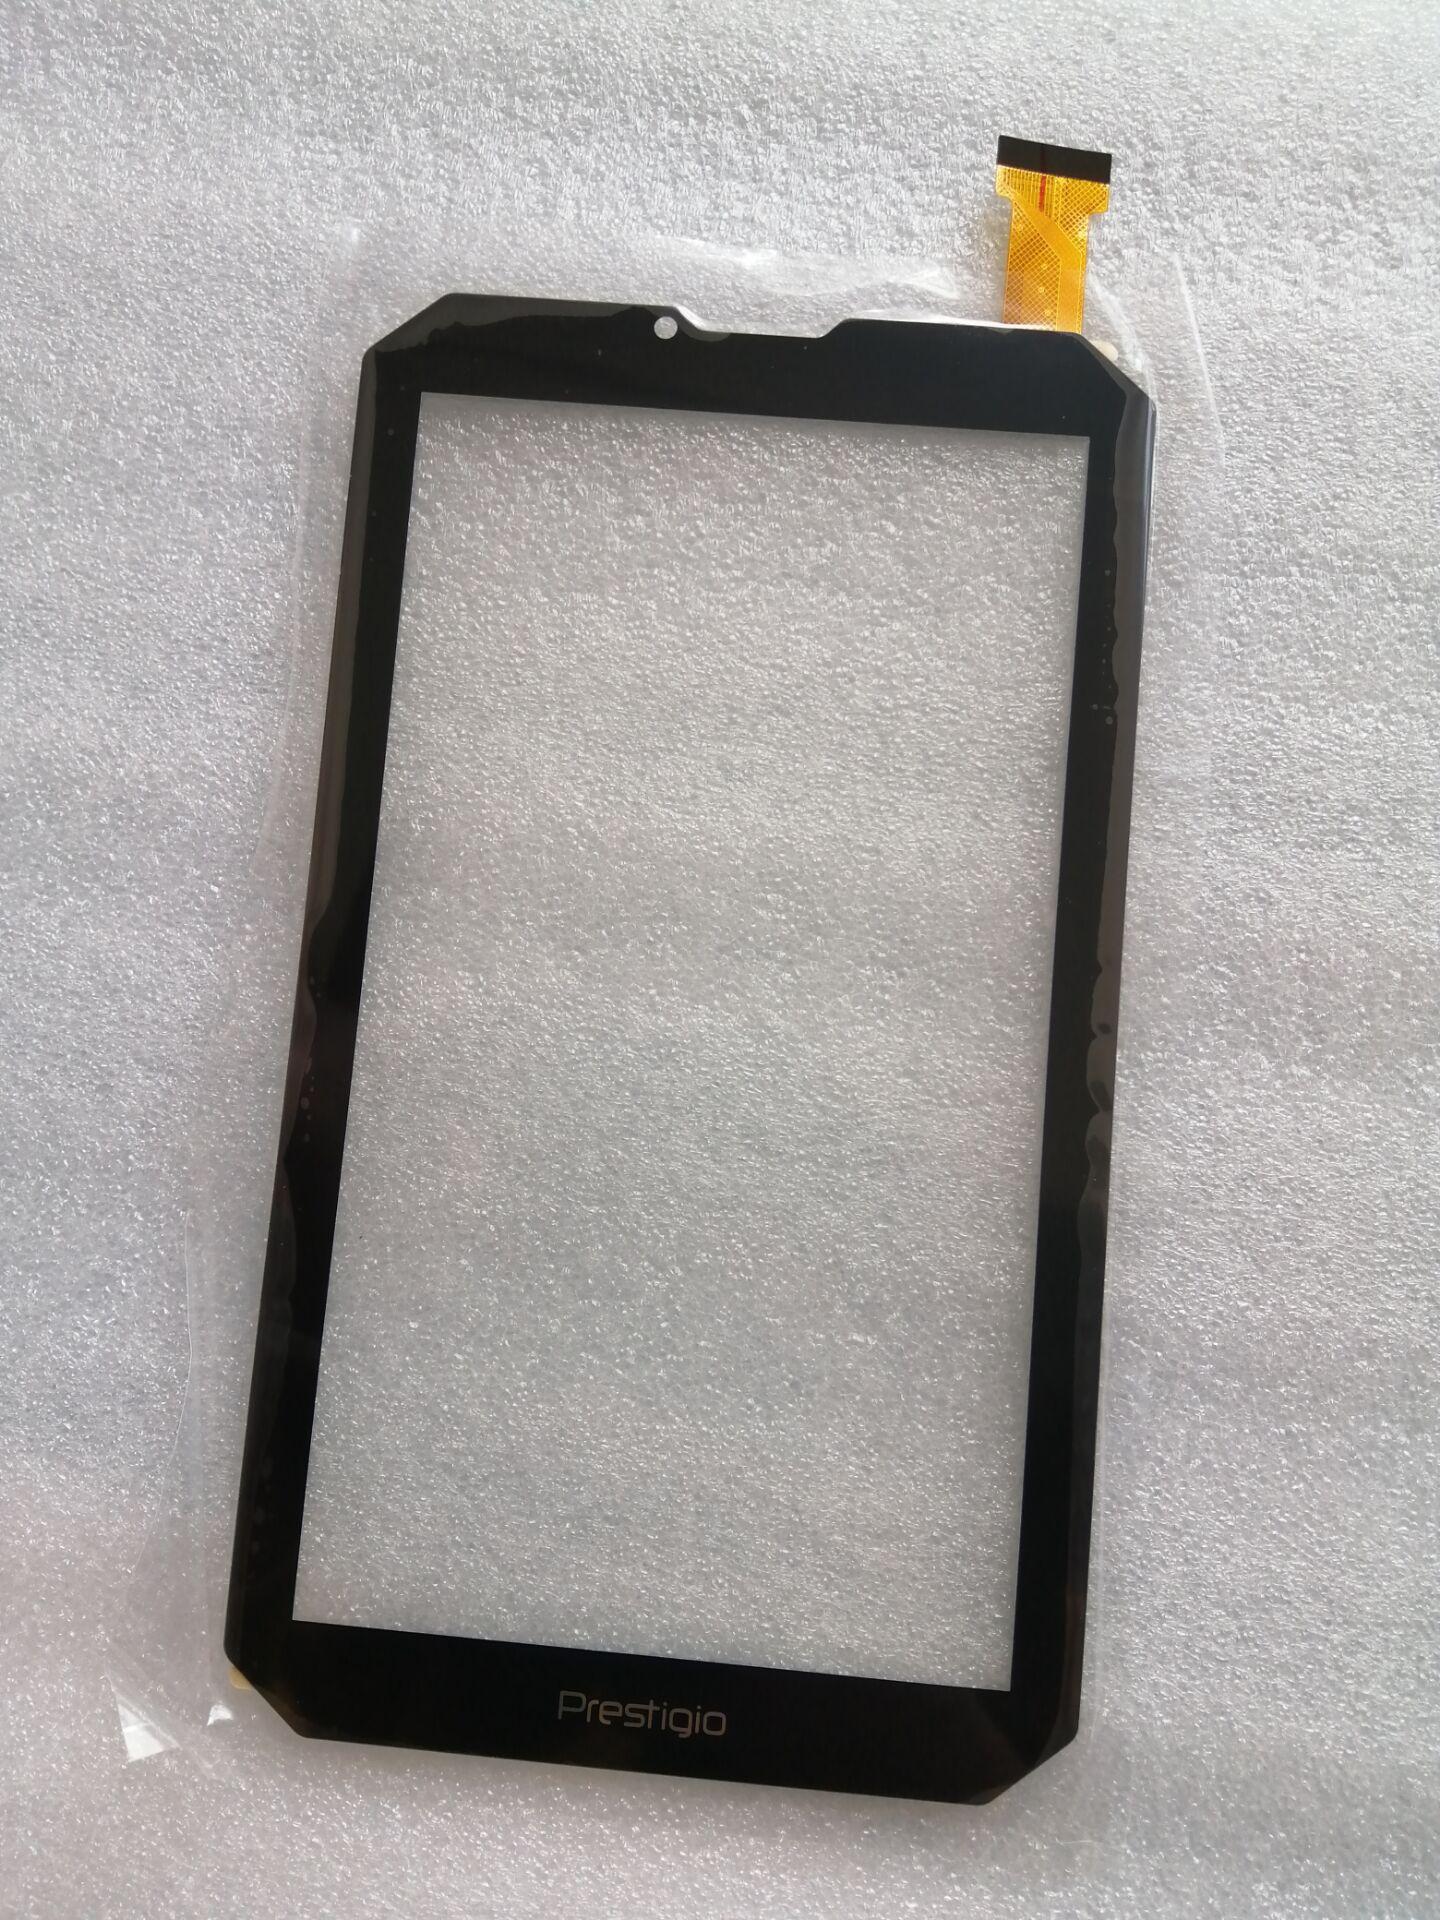 New 7 Inch Tablet Touch Screen For Dexp Ursus H270 3G Tablet Touch Screen Digitizer Glass Repair Panel Dexp Ursus H270 Tablet